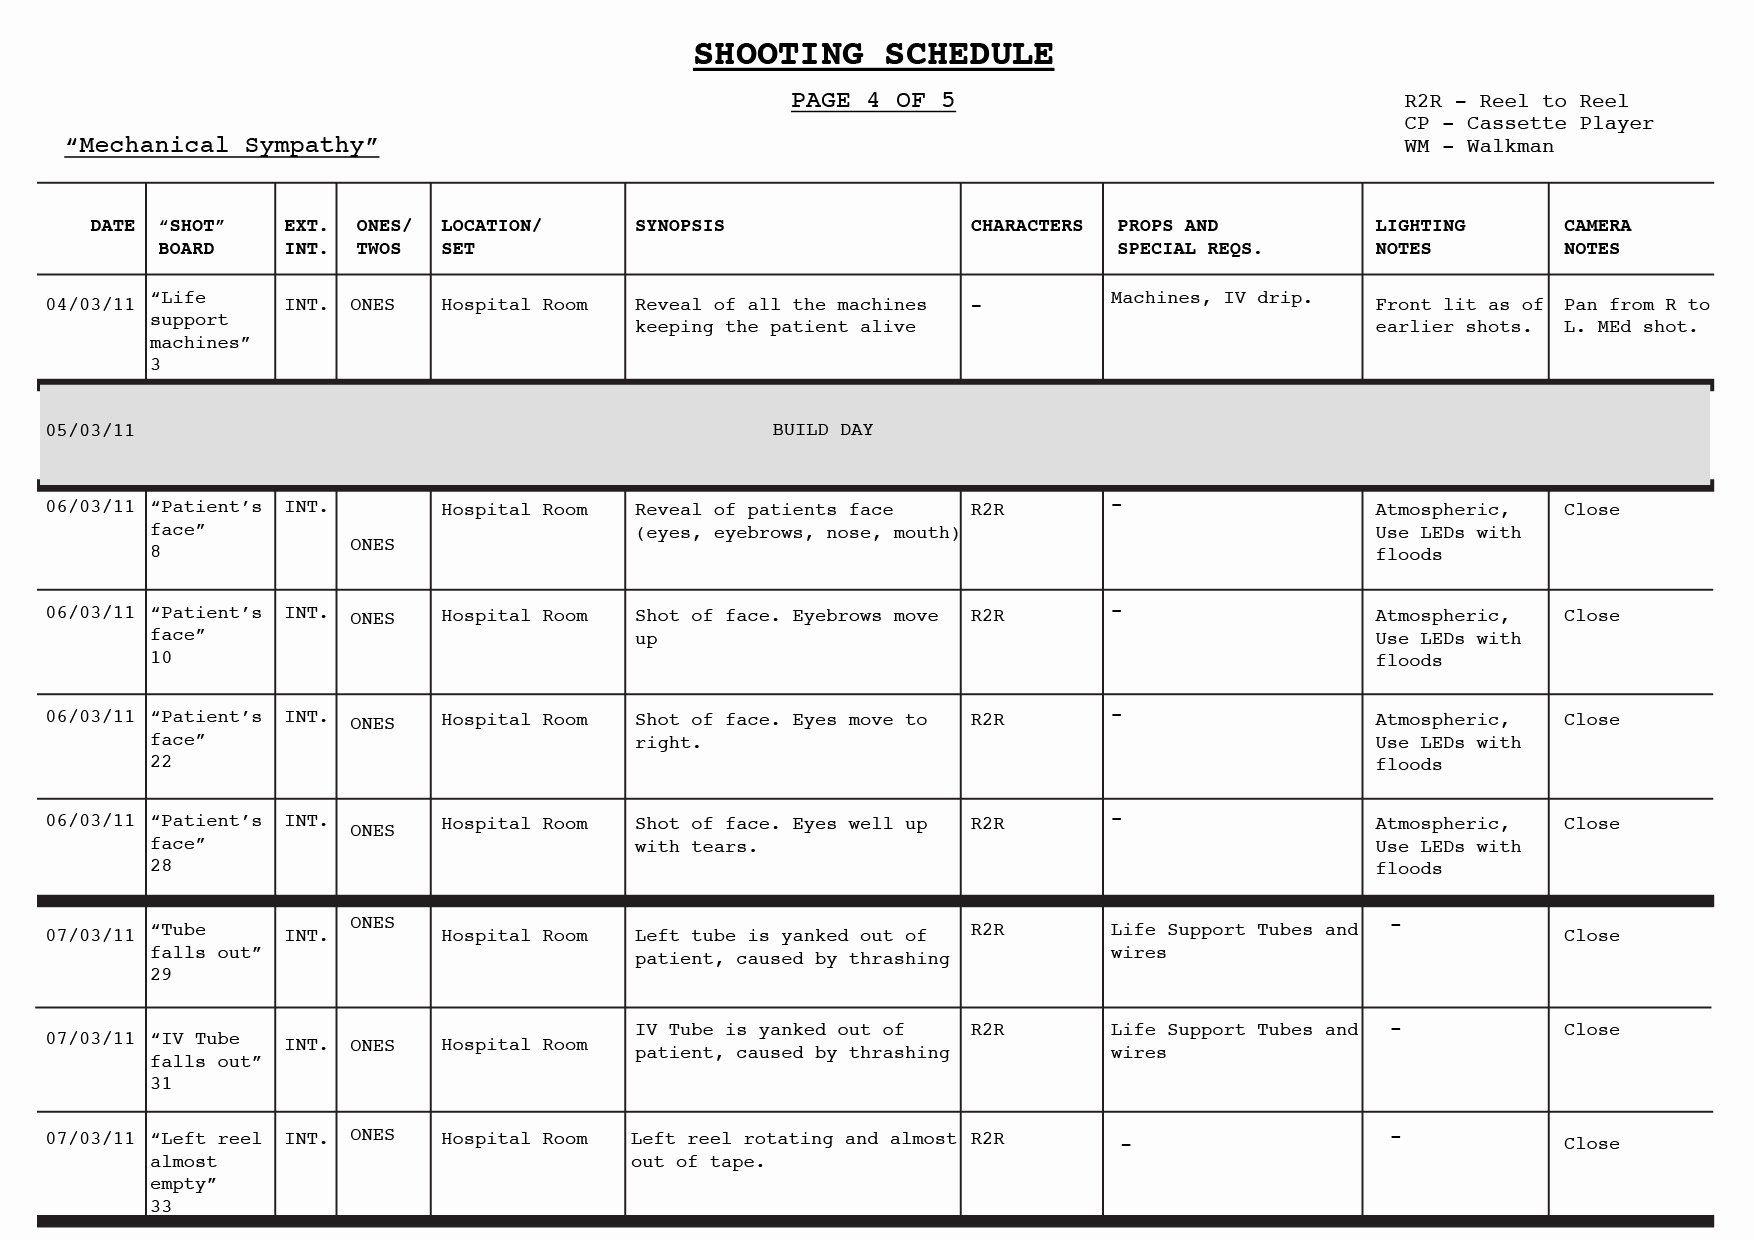 New Film Shooting Schedule Template In 2020 Schedule Templates